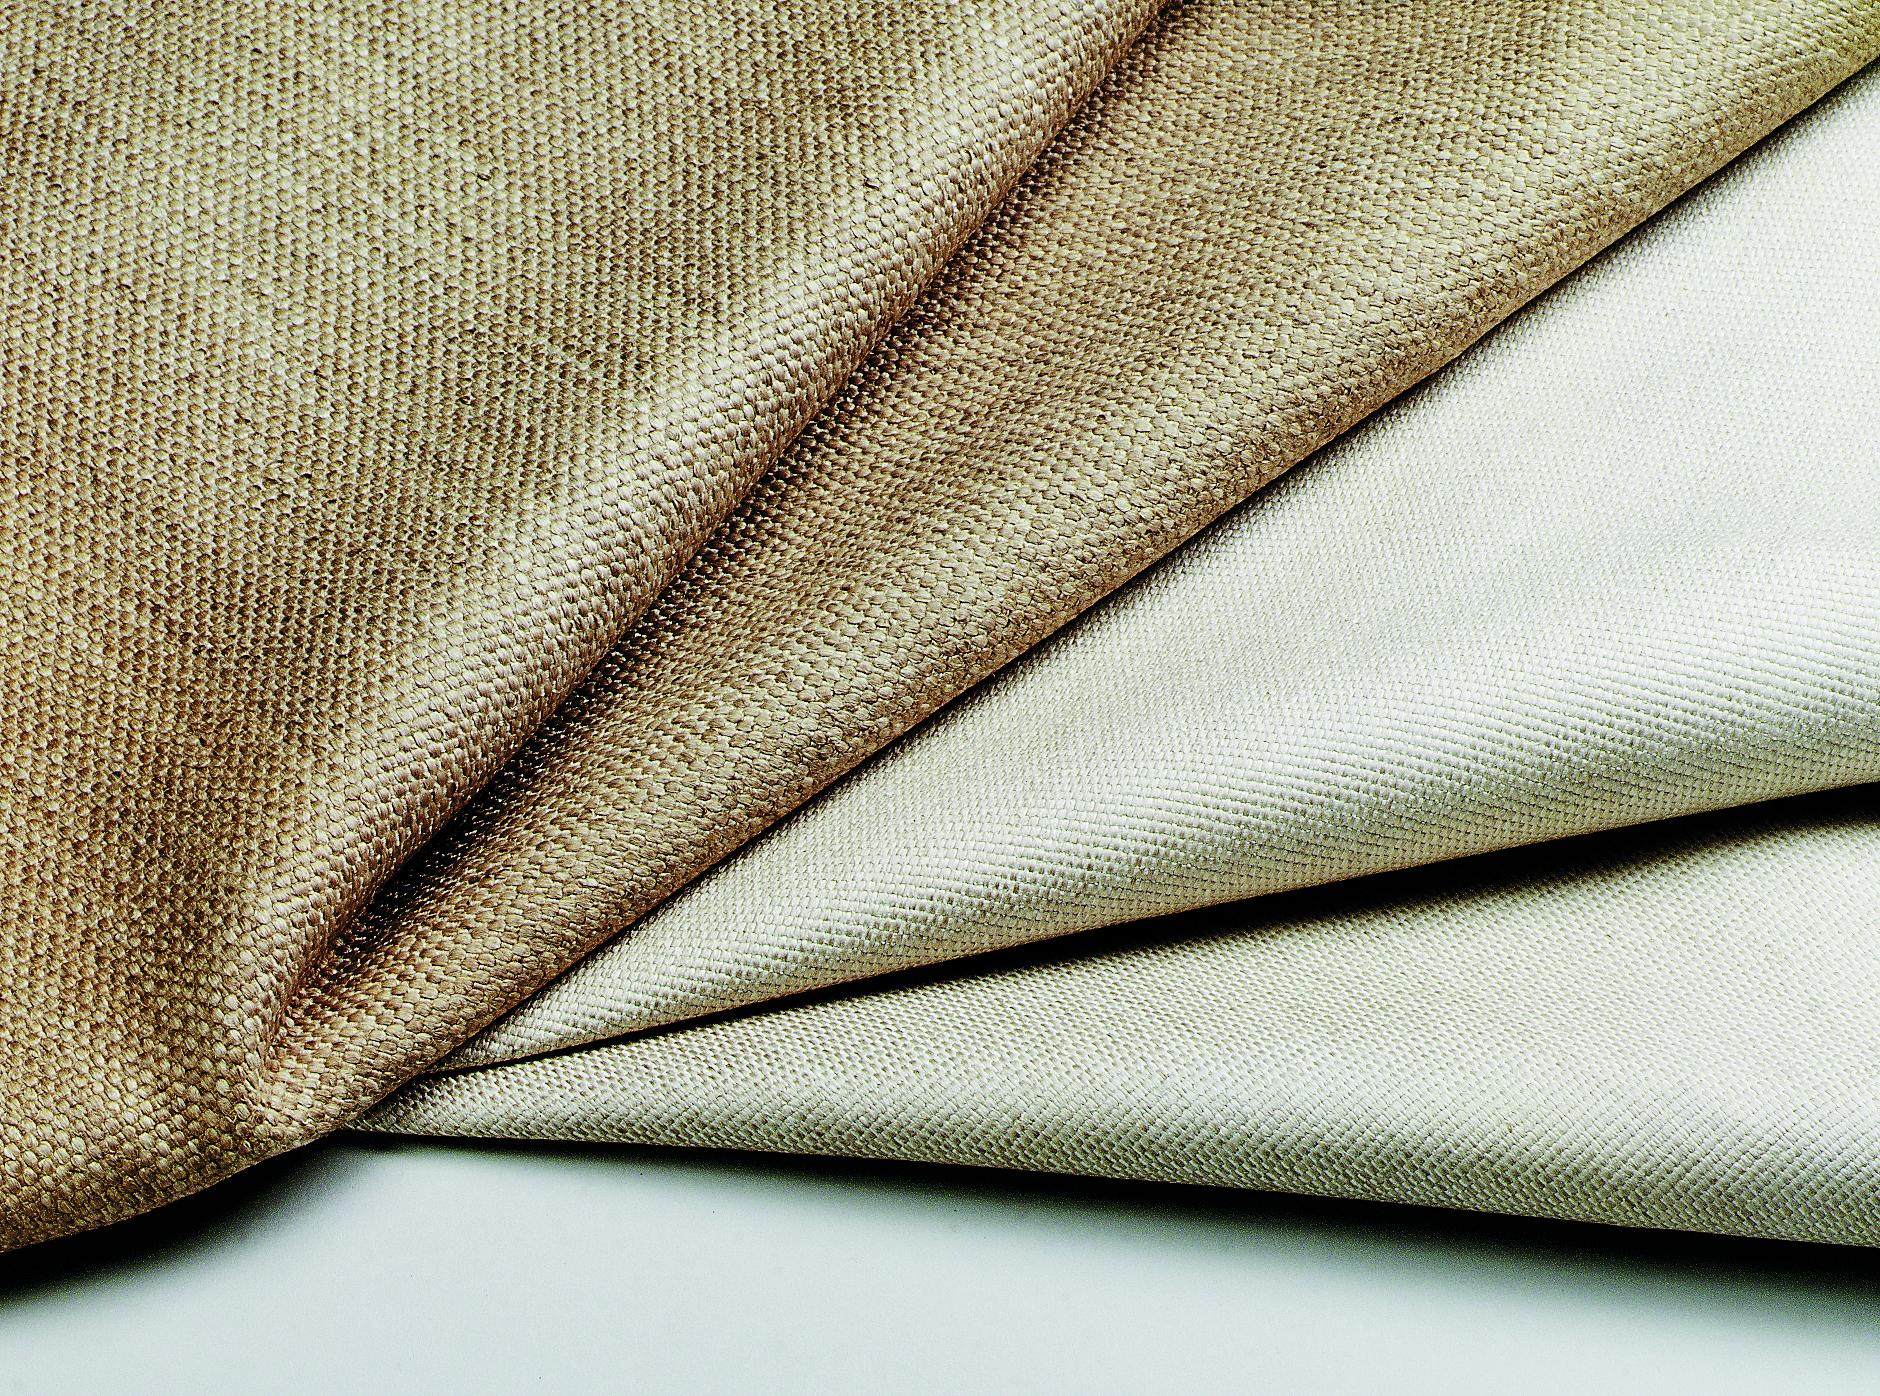 Ami Sil 174 Cas Abrasion Resistant Cloth